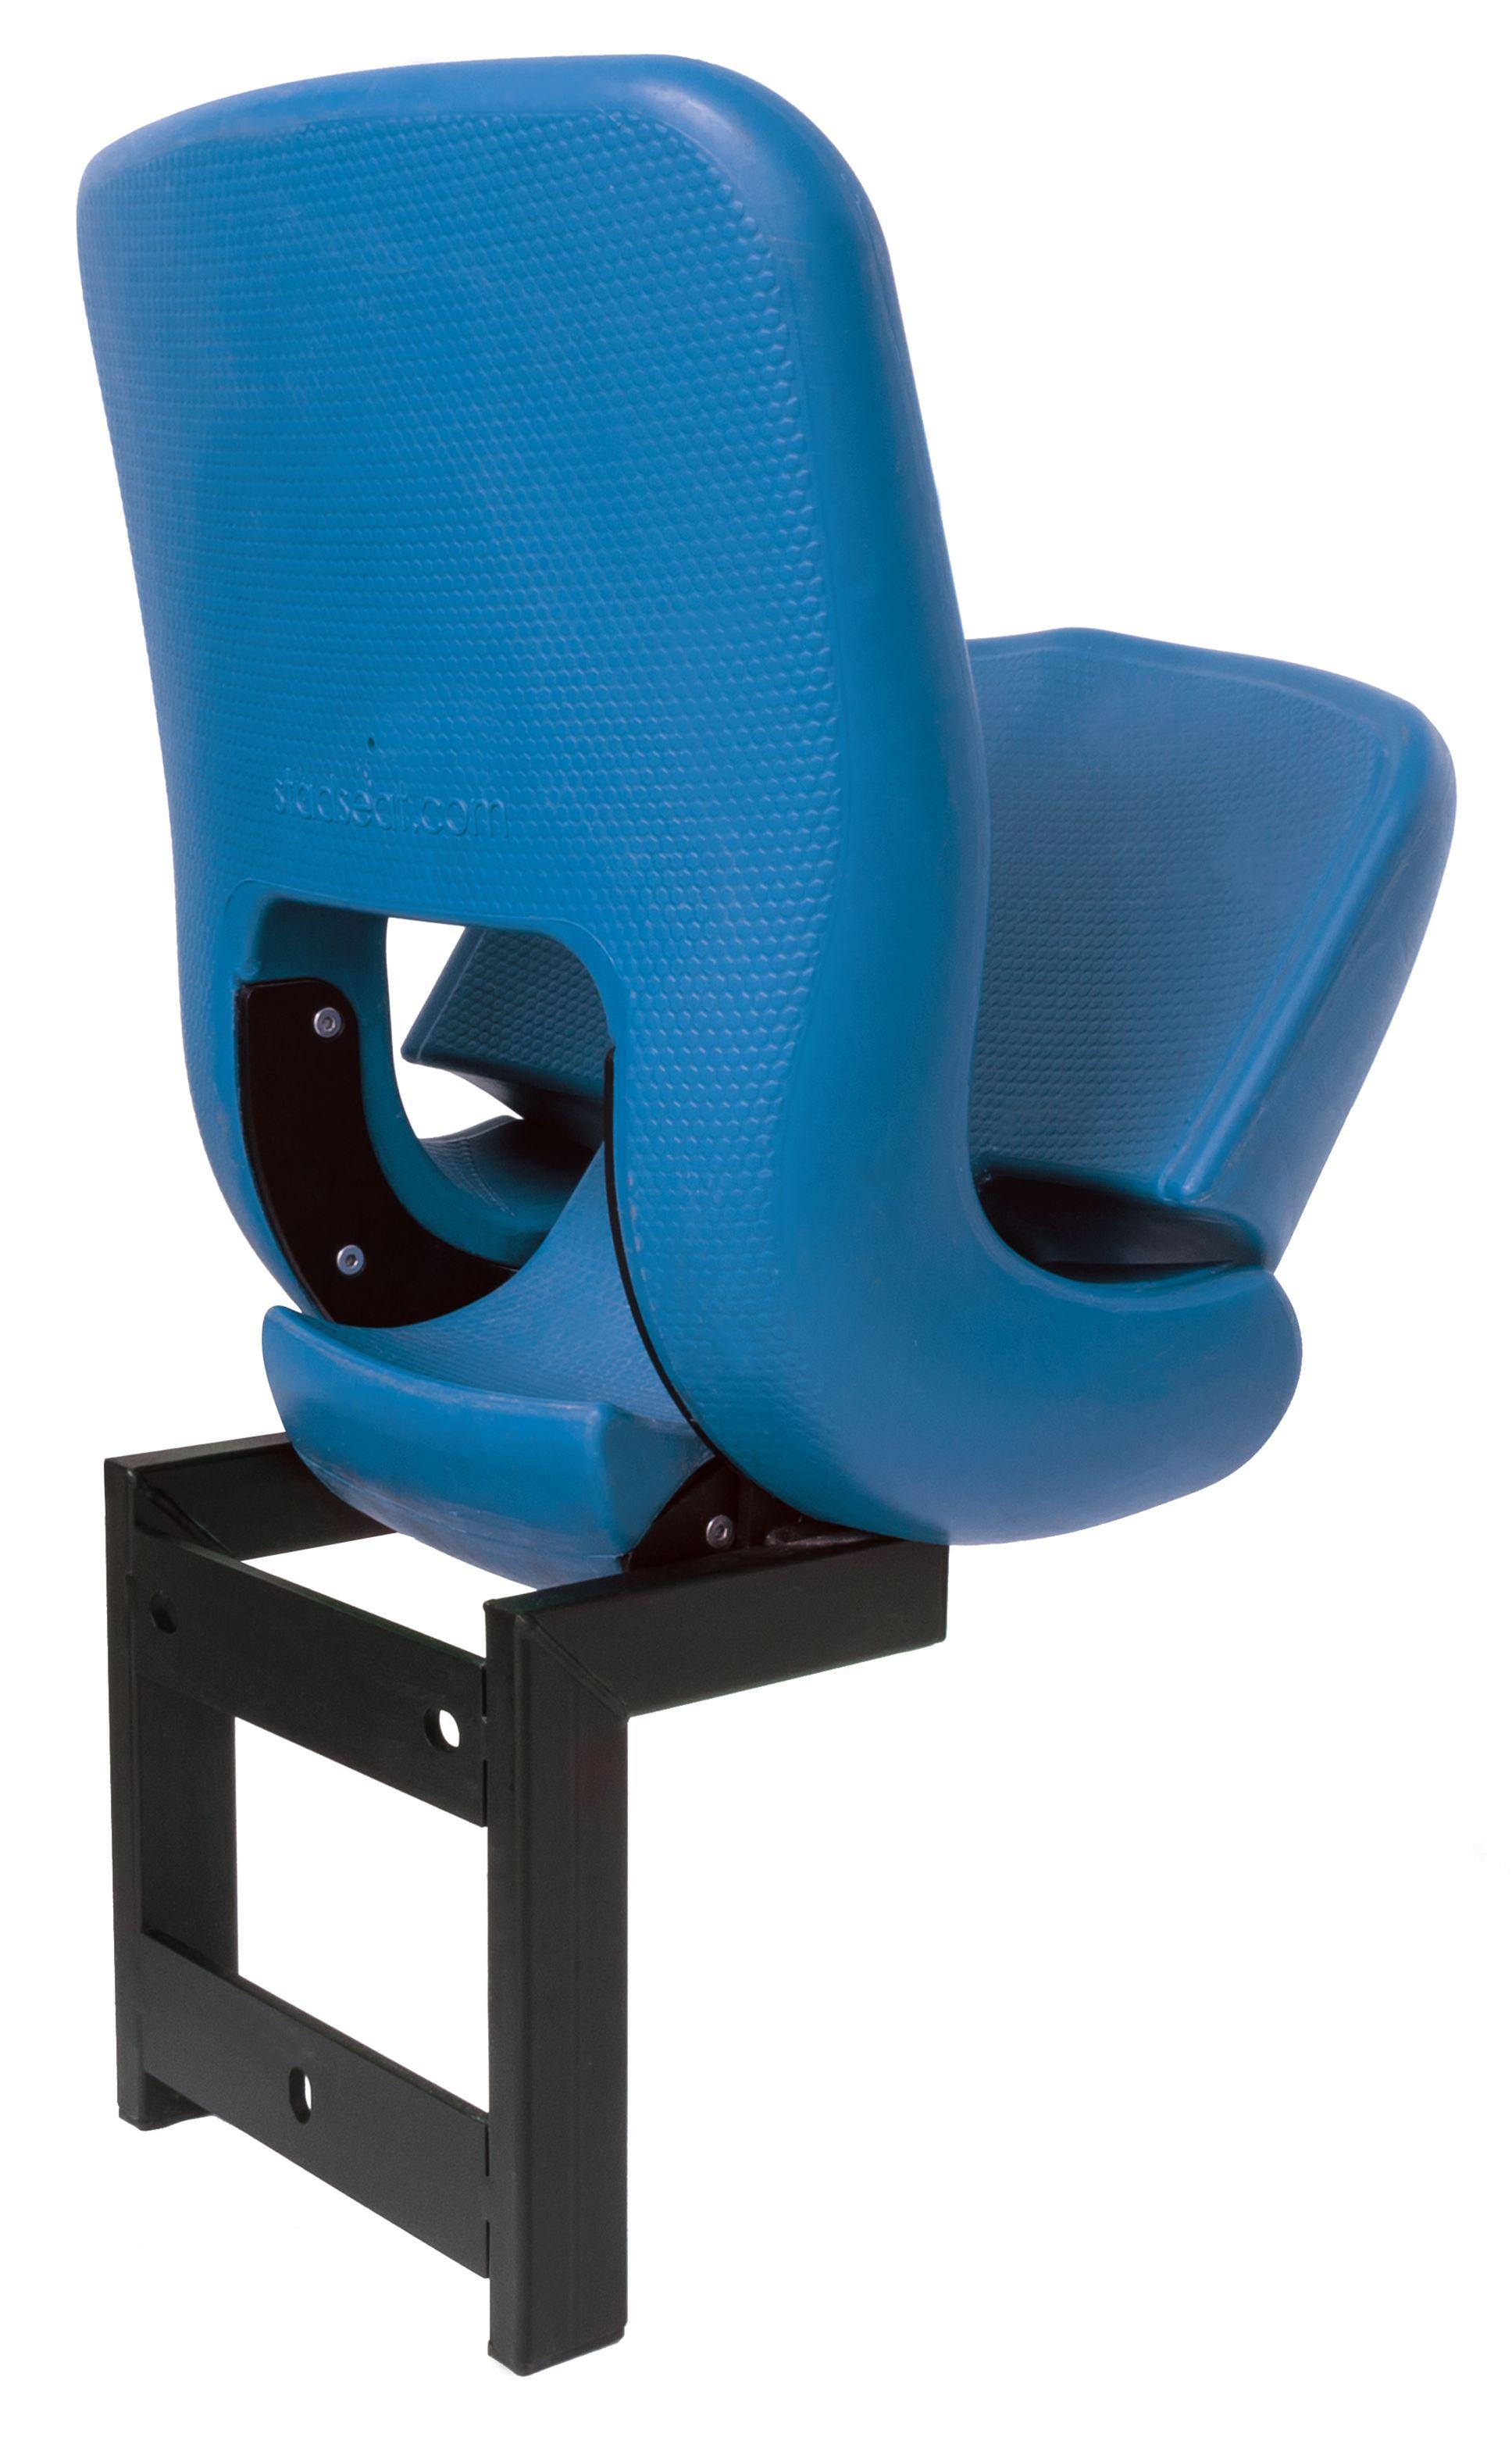 linea_backrest_monoblock_copolymer_pp_stadium_chair_seatorium_43